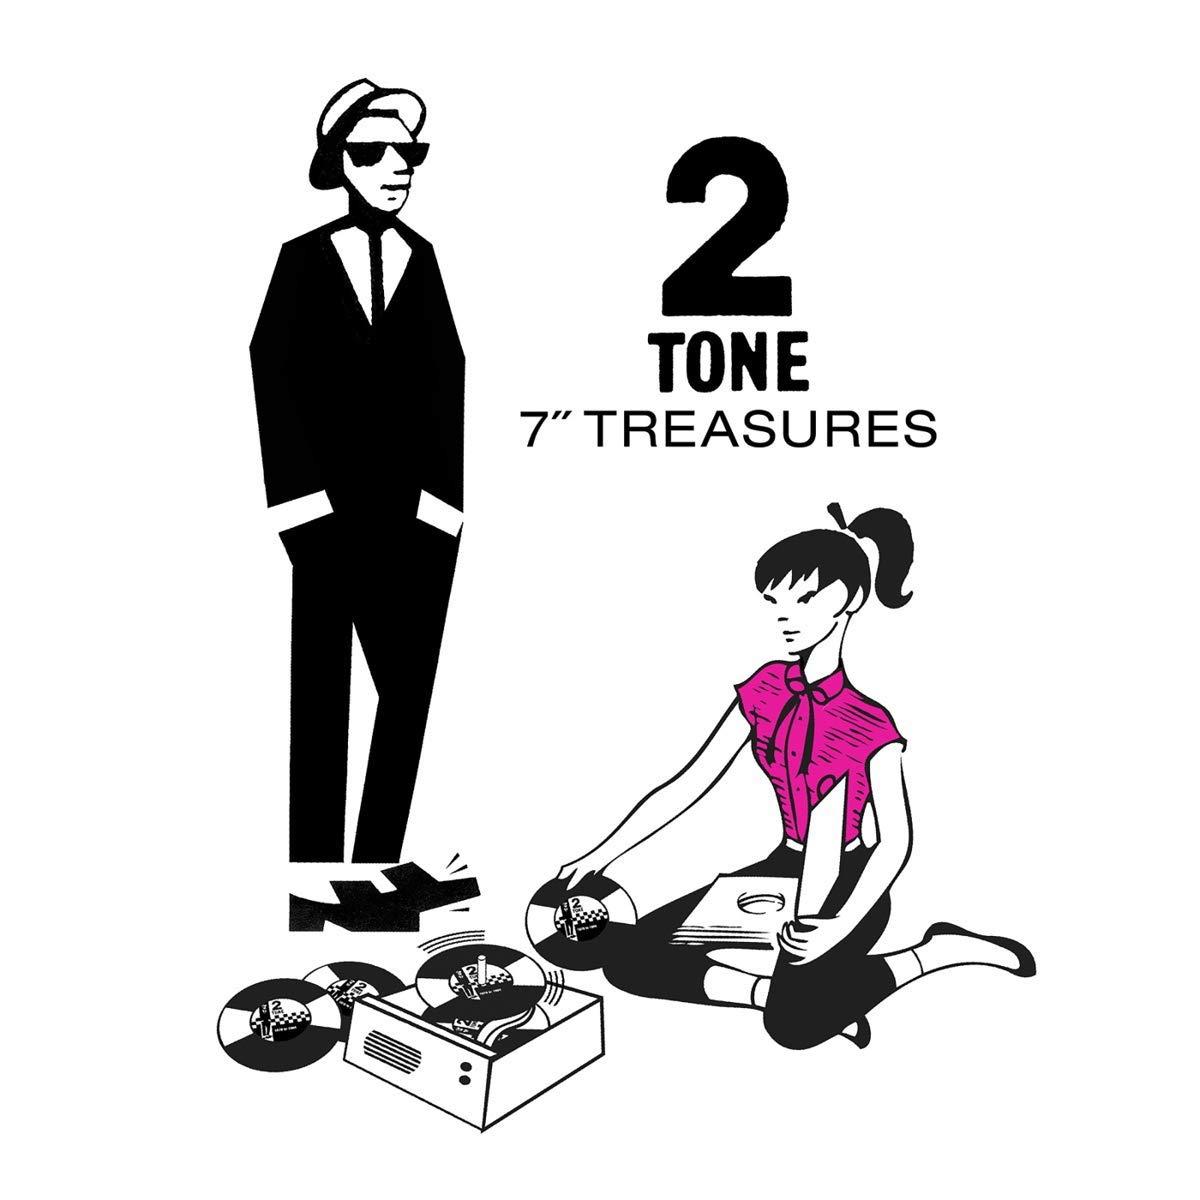 Copertina Vinile 33 giri 2 Tone 7″ Treasures [Cofanetto 12x45 Giri] di Vari Artisti